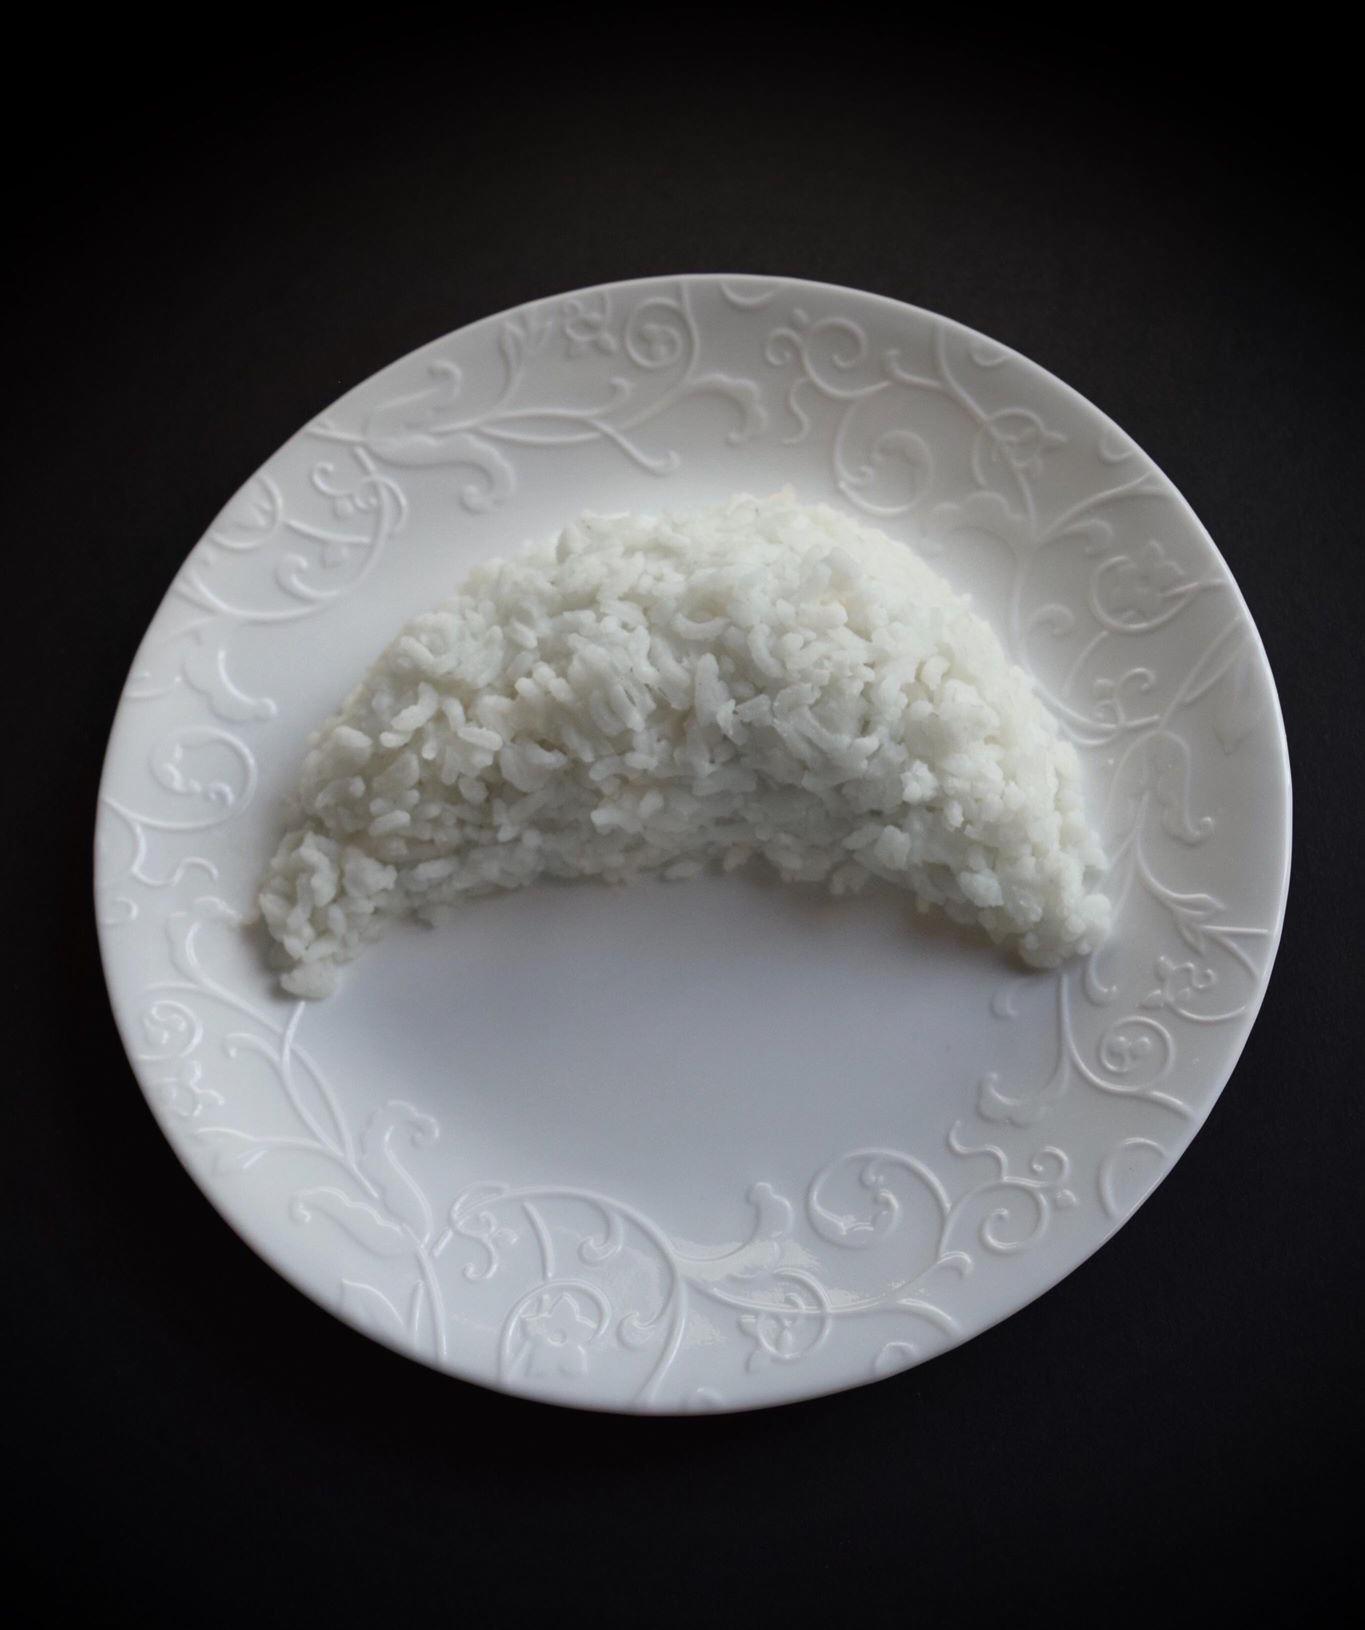 rice2[edit]